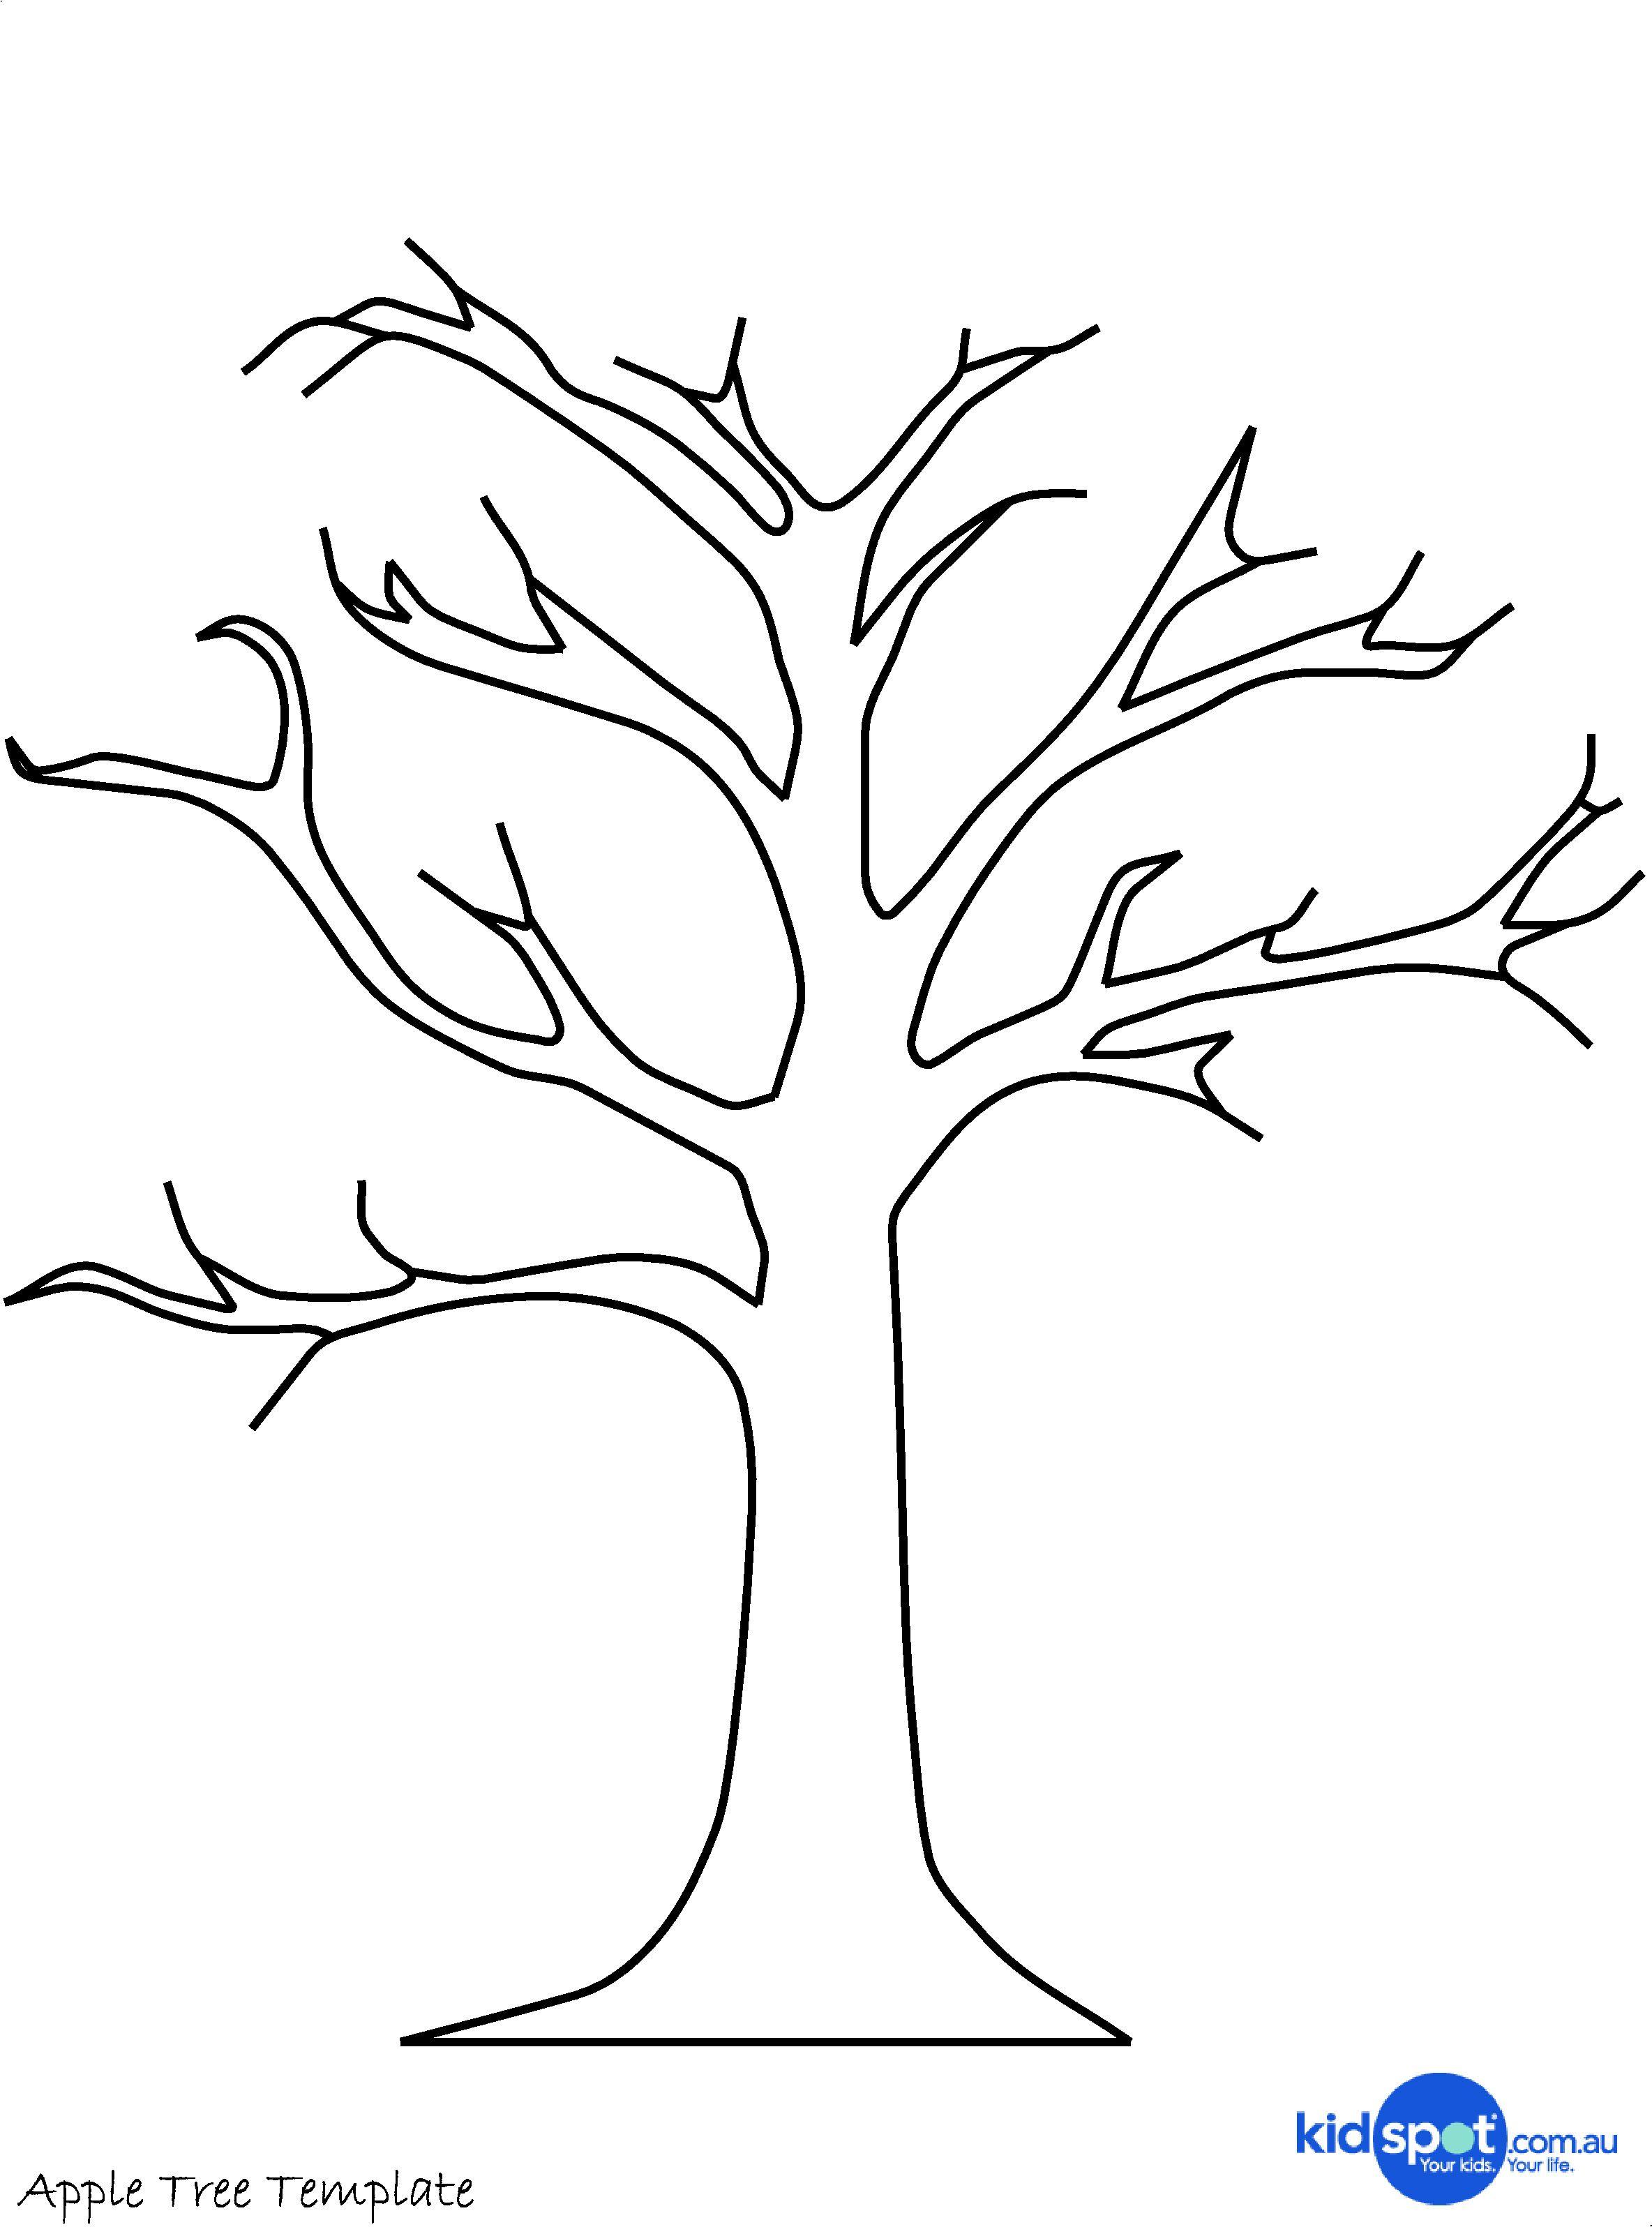 Tree craft: cork stamp apple tree | Decor ideas | Pinterest | Tree